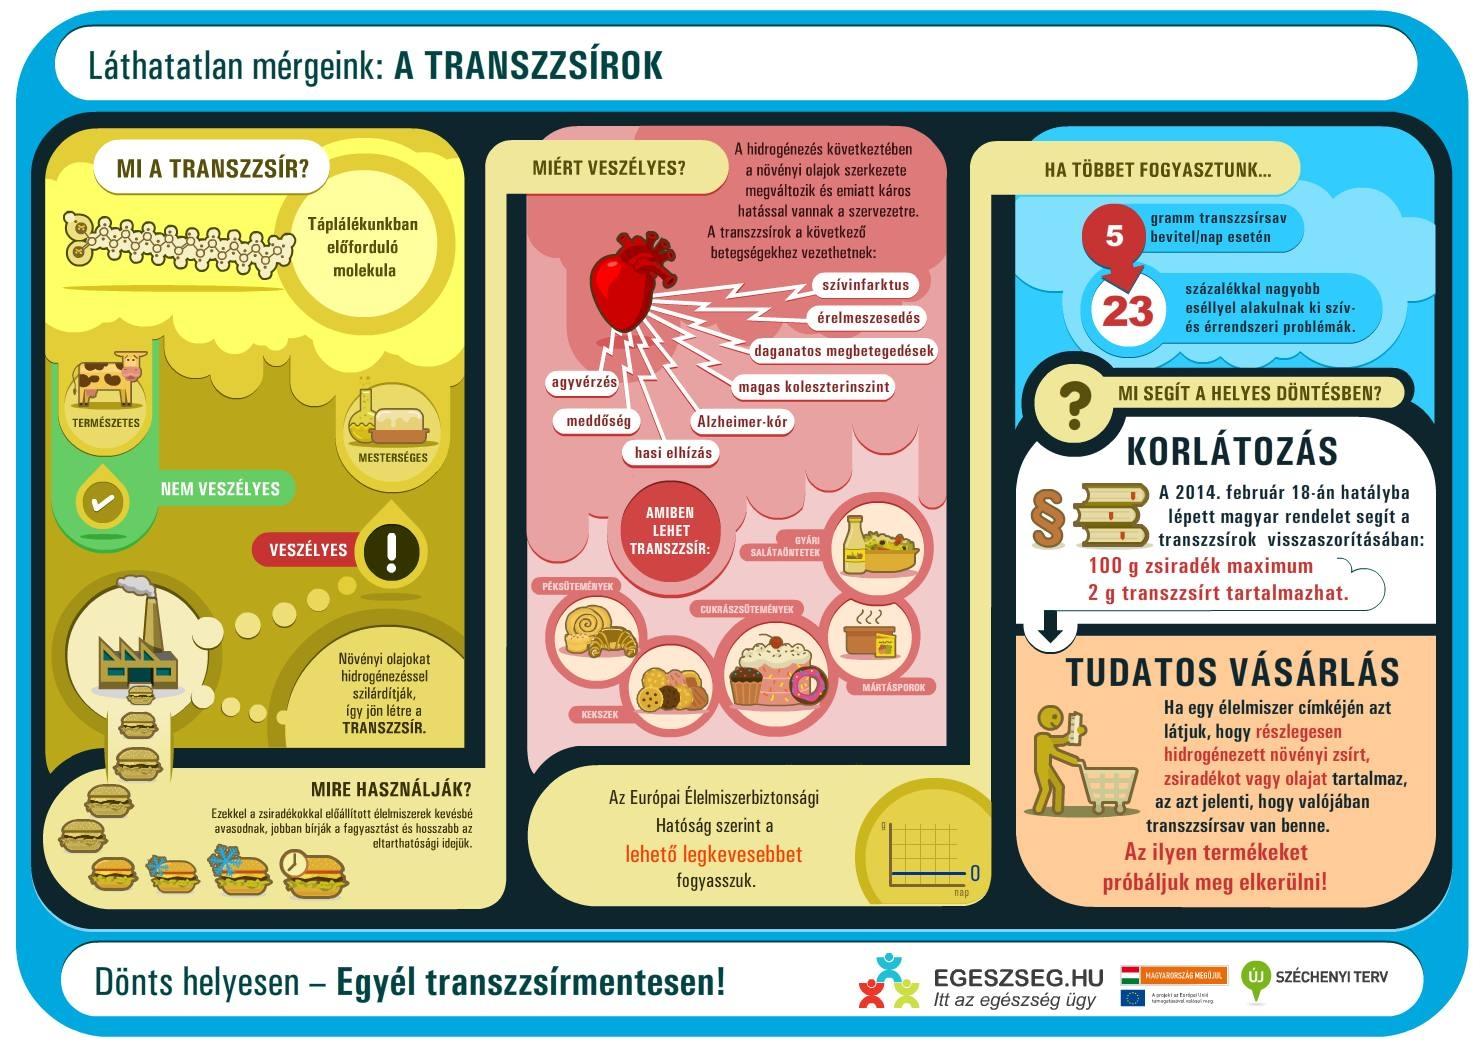 transzzsir_infografika_2014_02_26.jpg